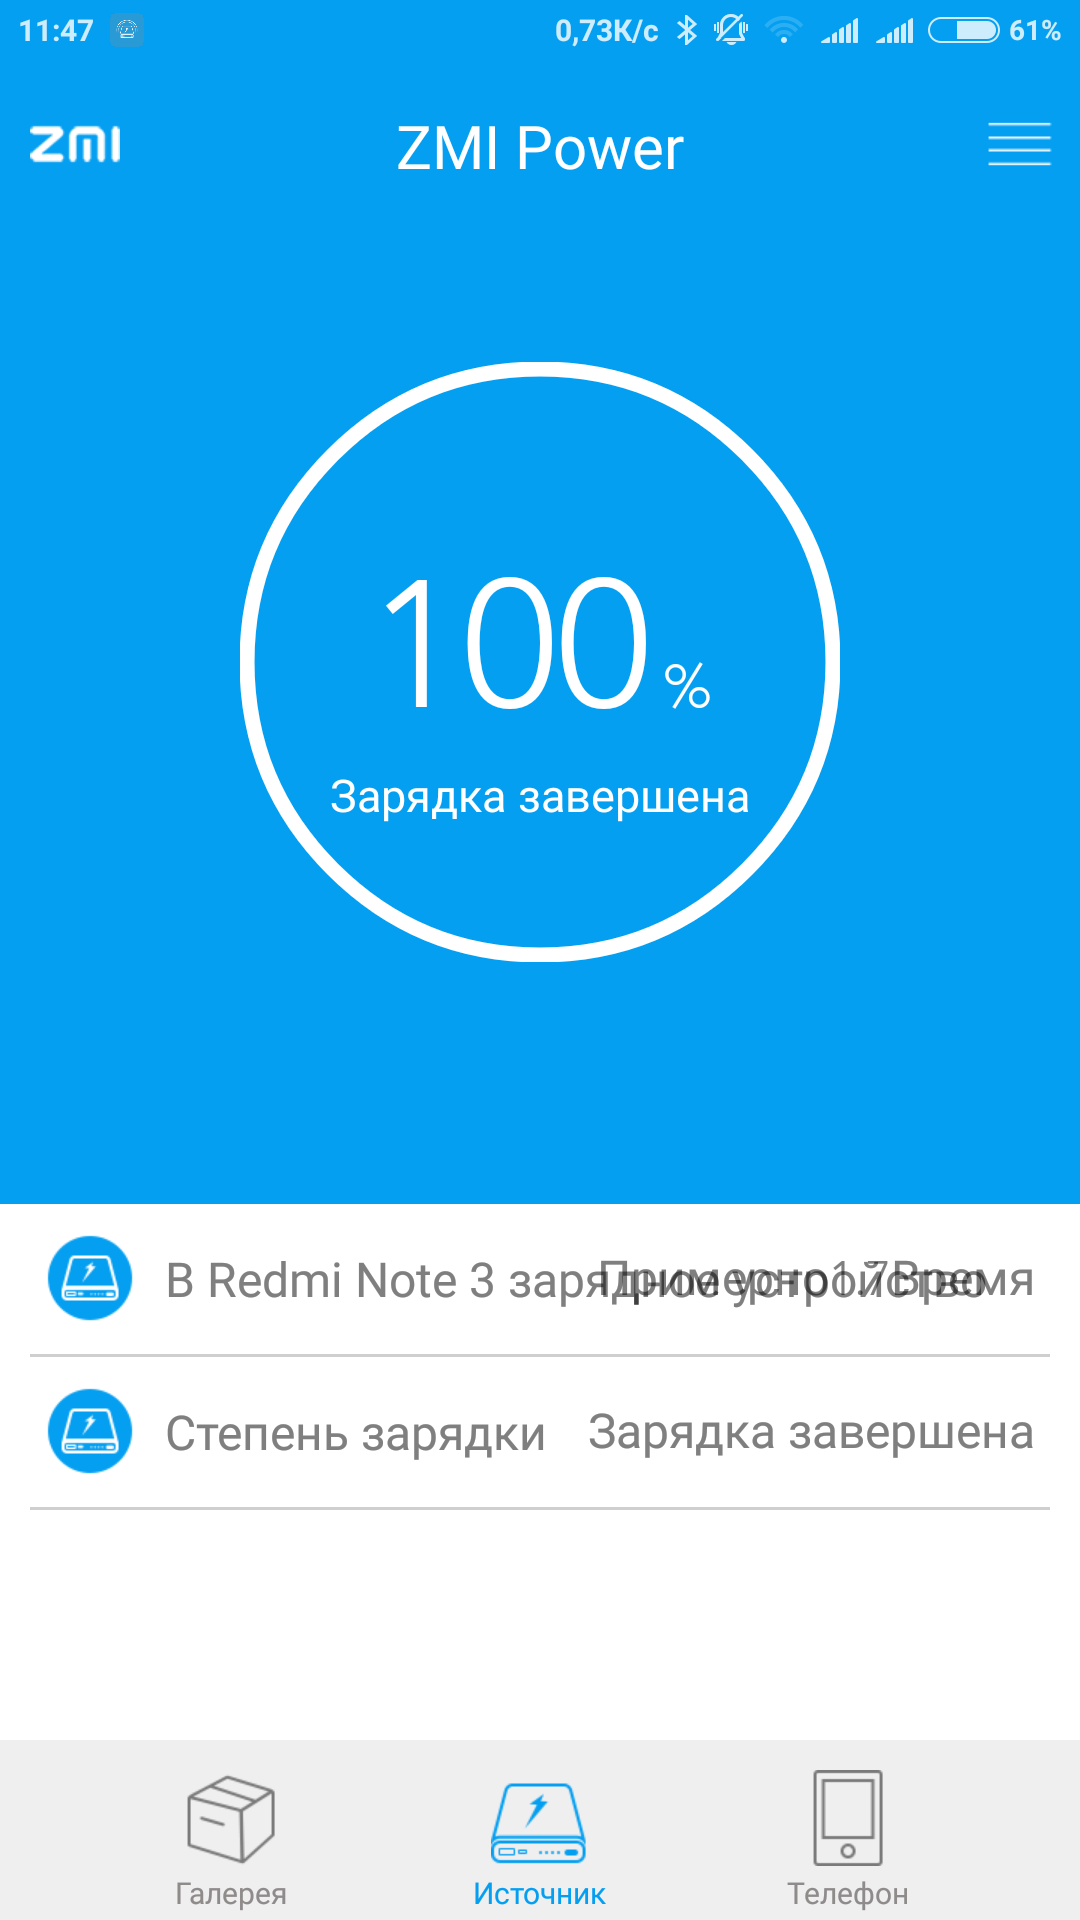 GearBest: Обзор powerbank Xiaomi ZMI HB810 10000 мАч с Bluetooth